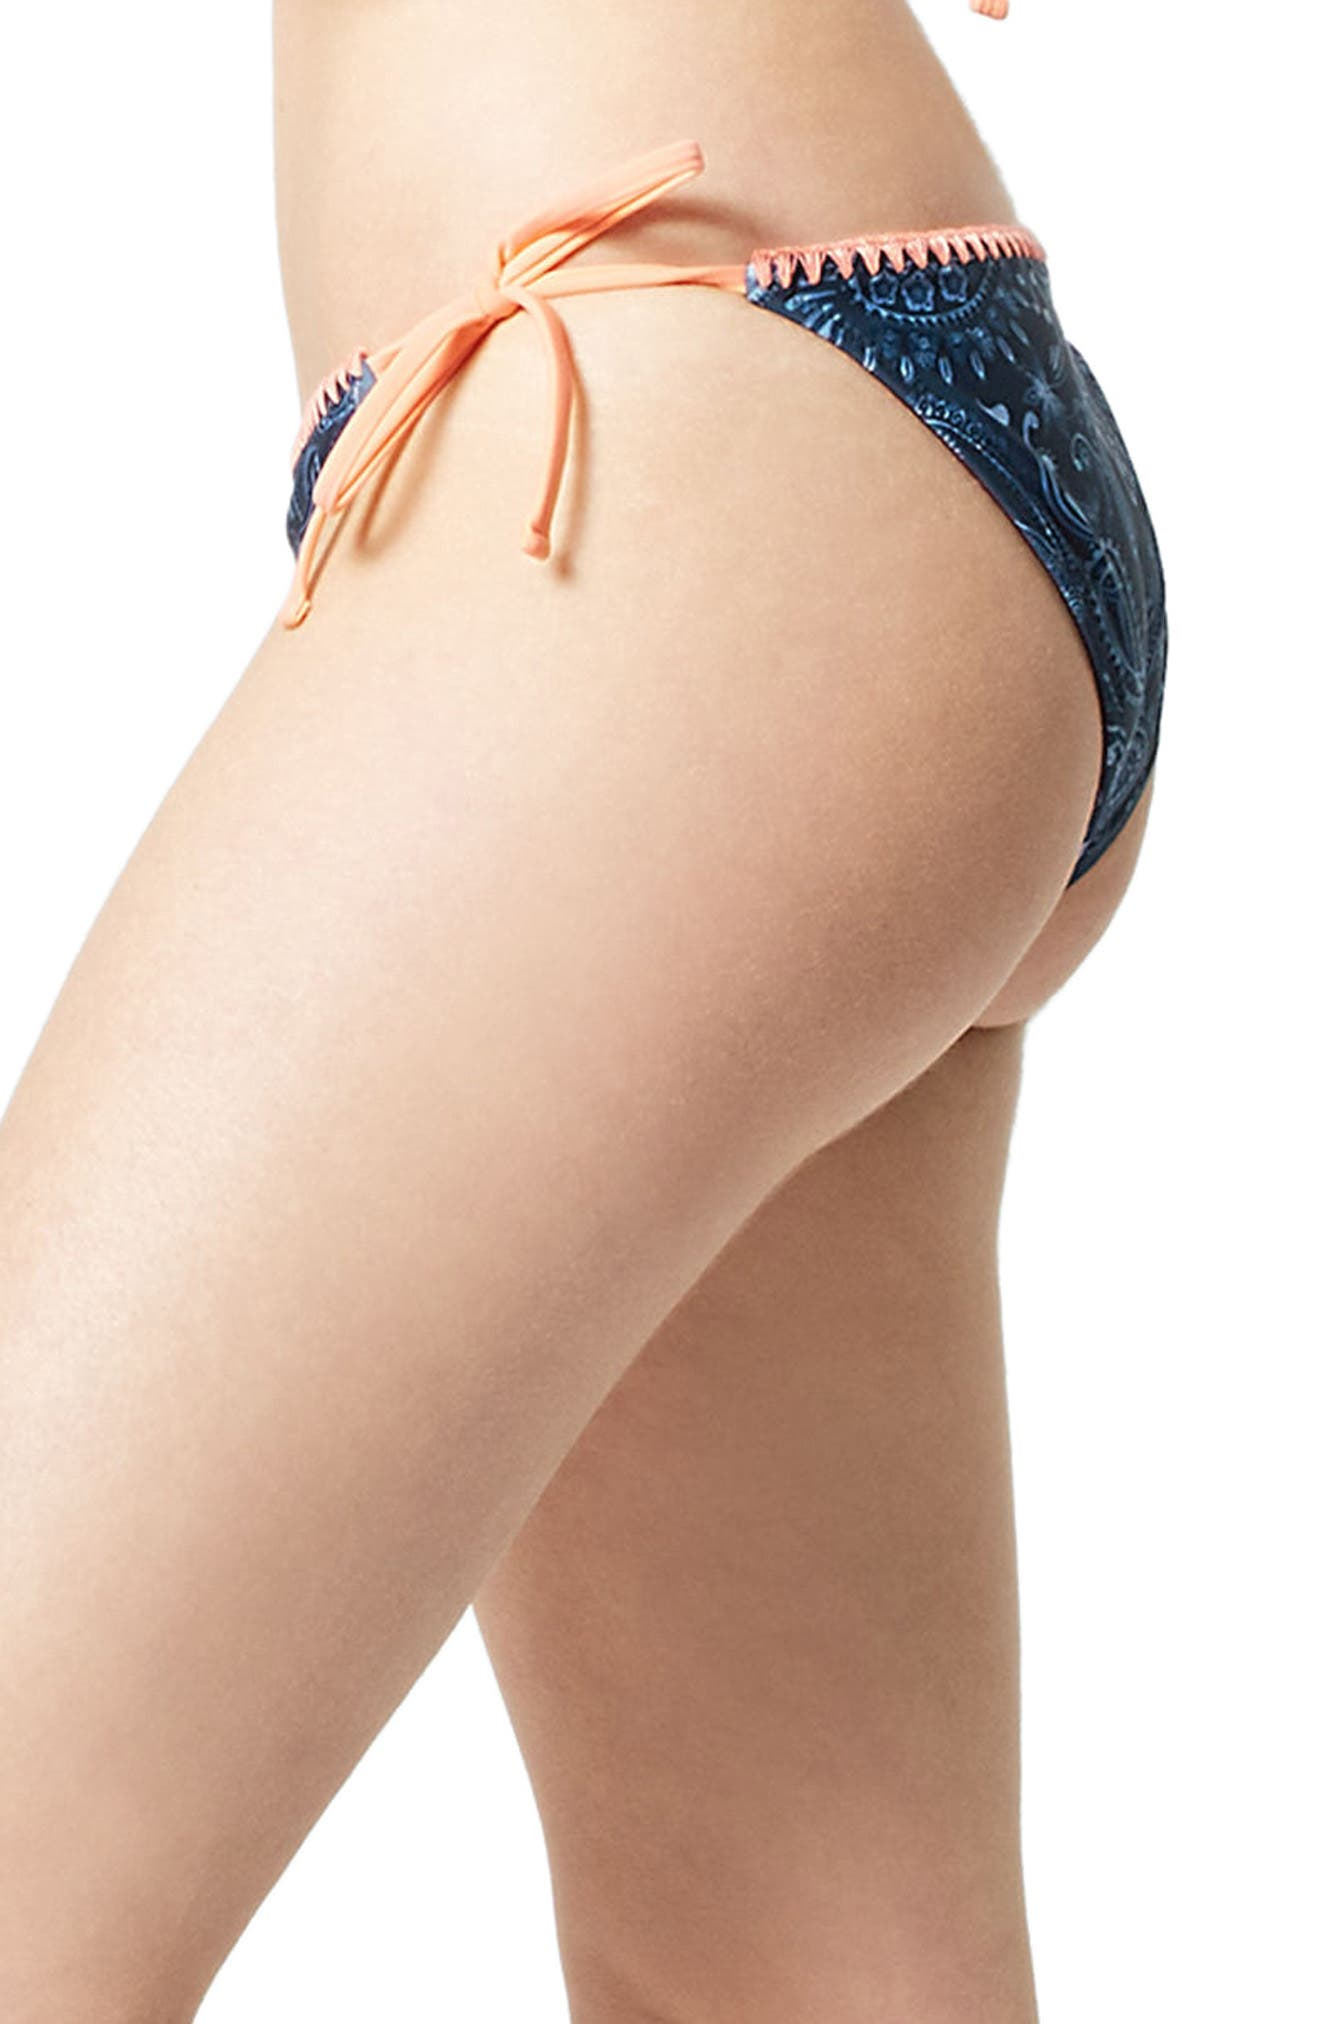 Purity Reversible Bikini Bottoms,                             Alternate thumbnail 4, color,                             400